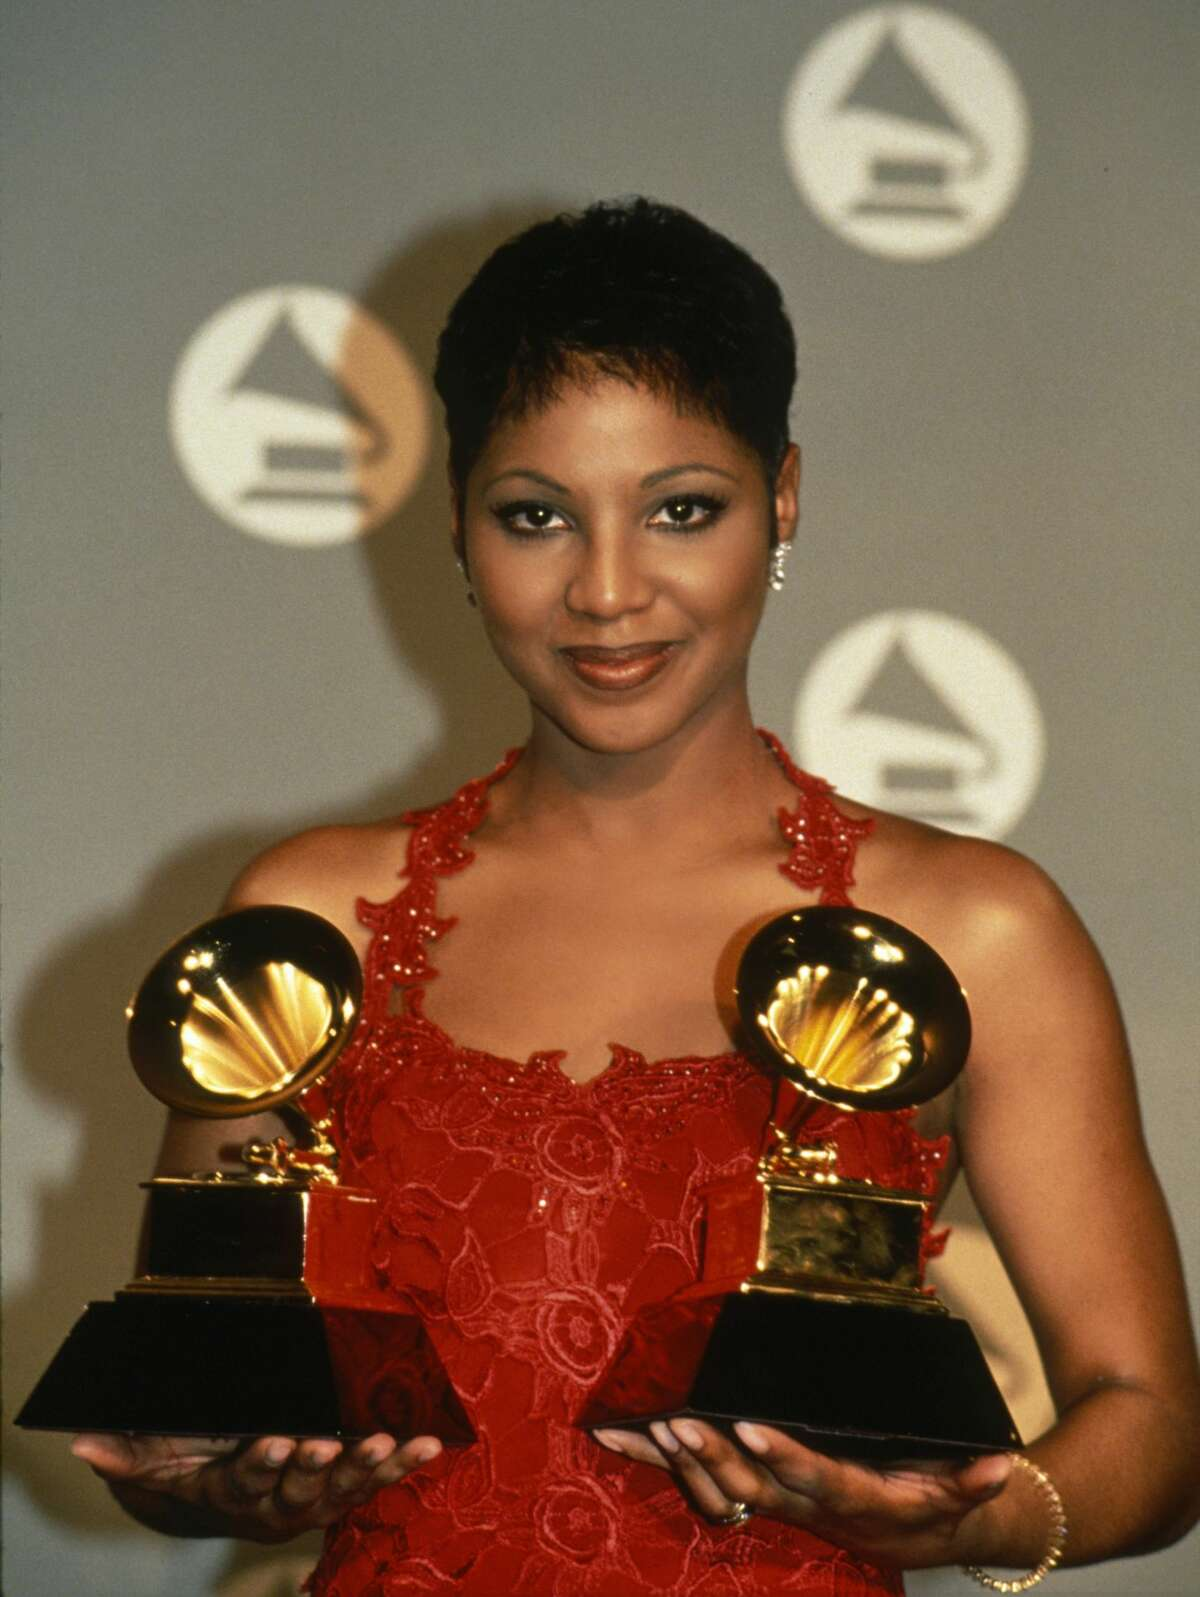 Year: 1993, 36th Annual Grammy Awards Best New Artist: Toni Braxton